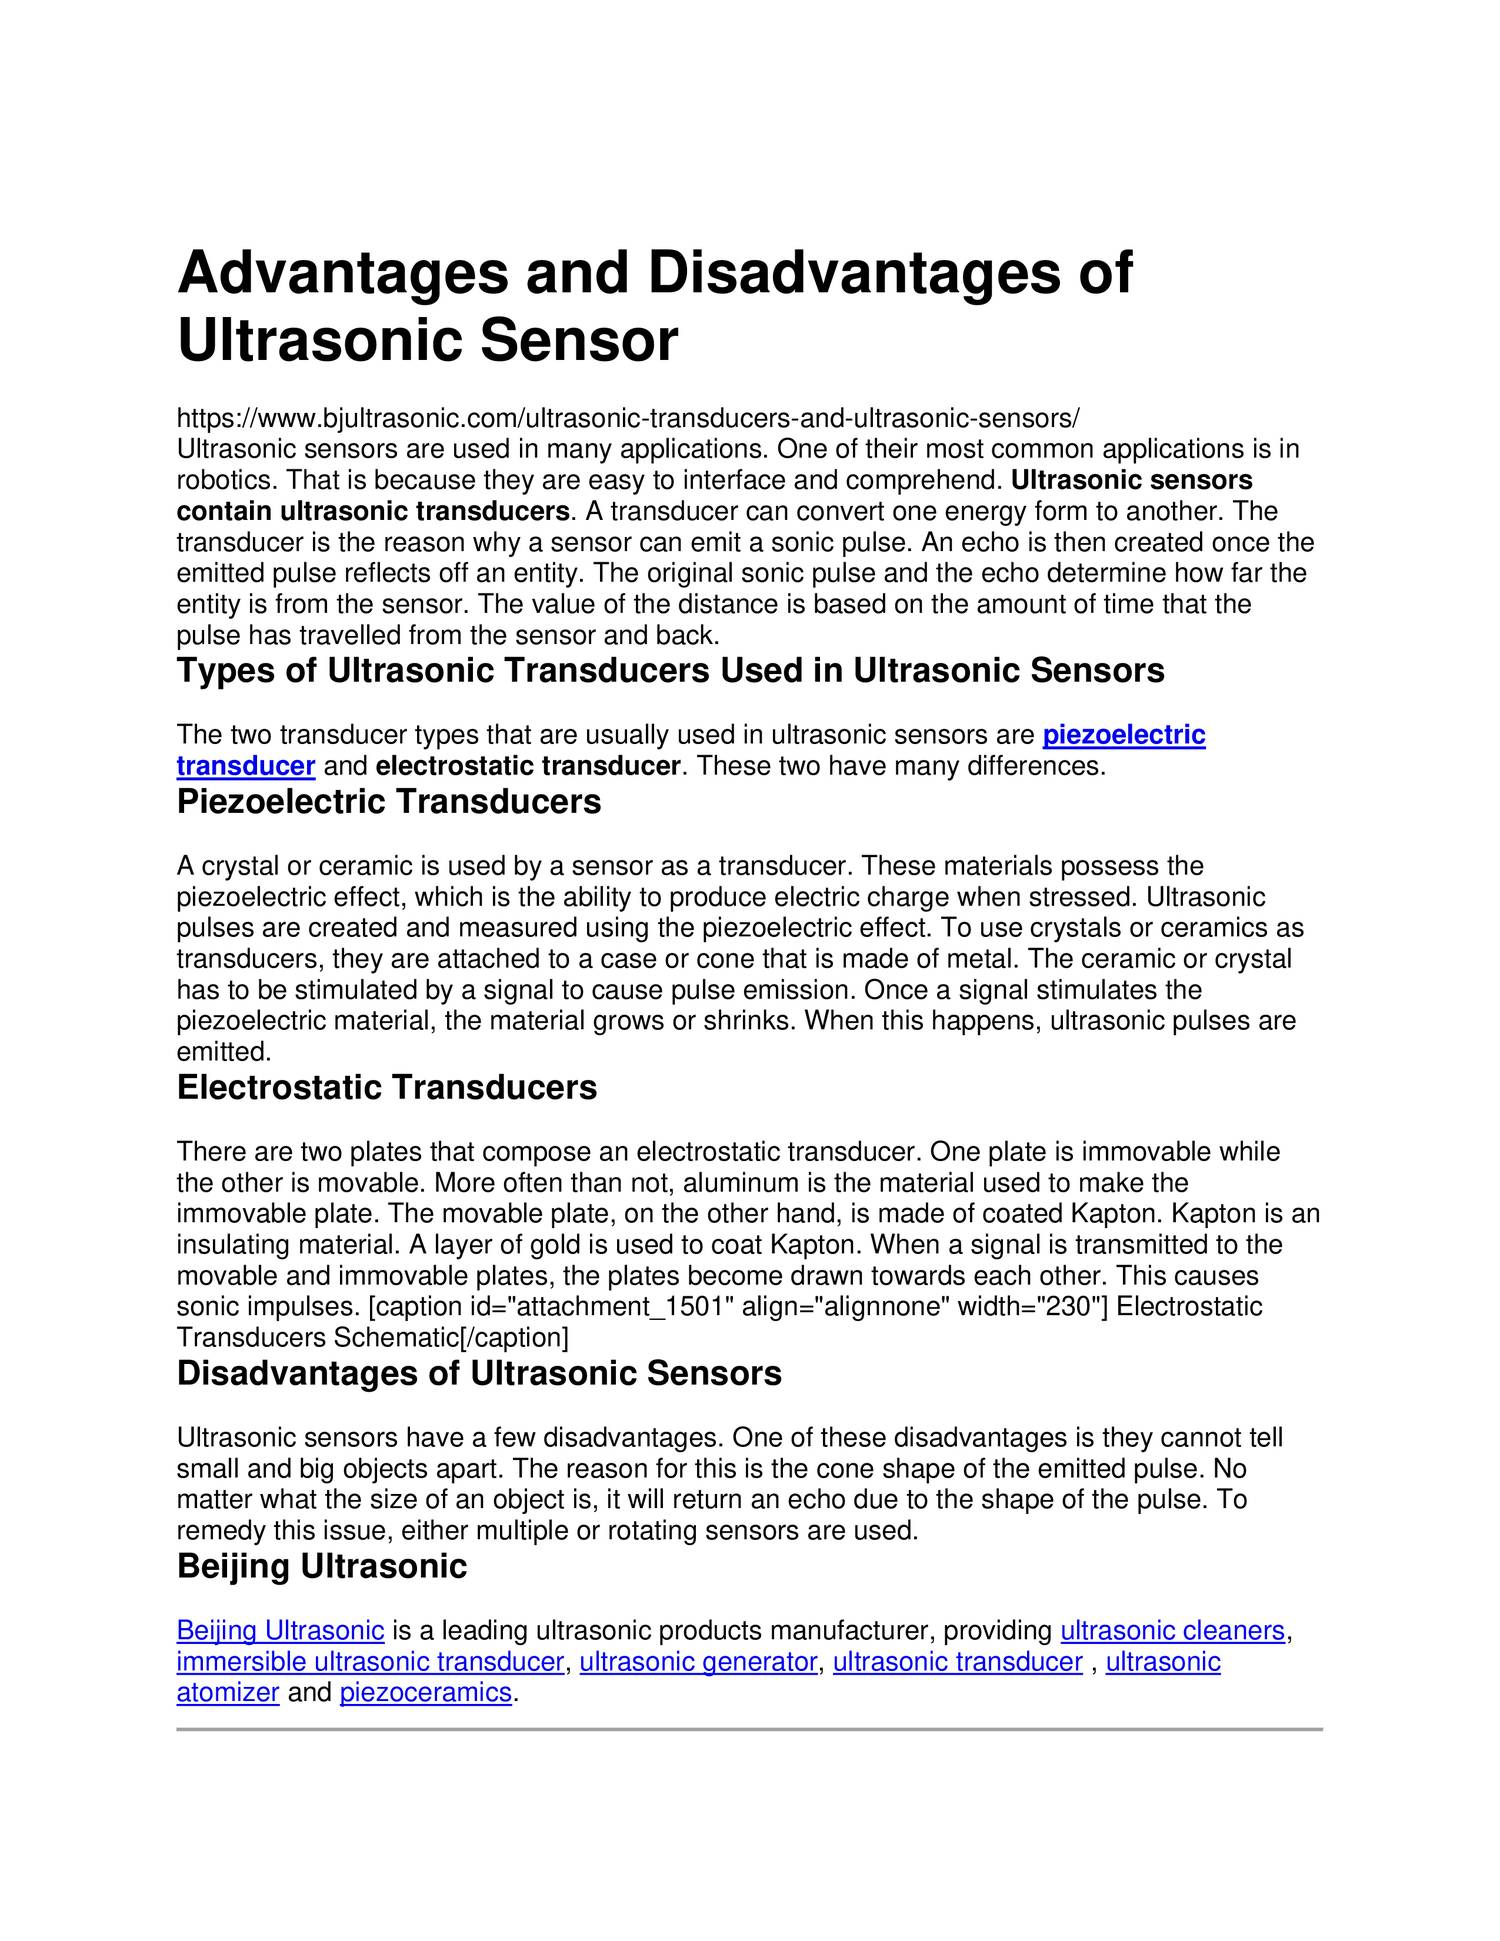 Advantages and Disadvantages of Ultrasonic Sensor pdf | DocDroid